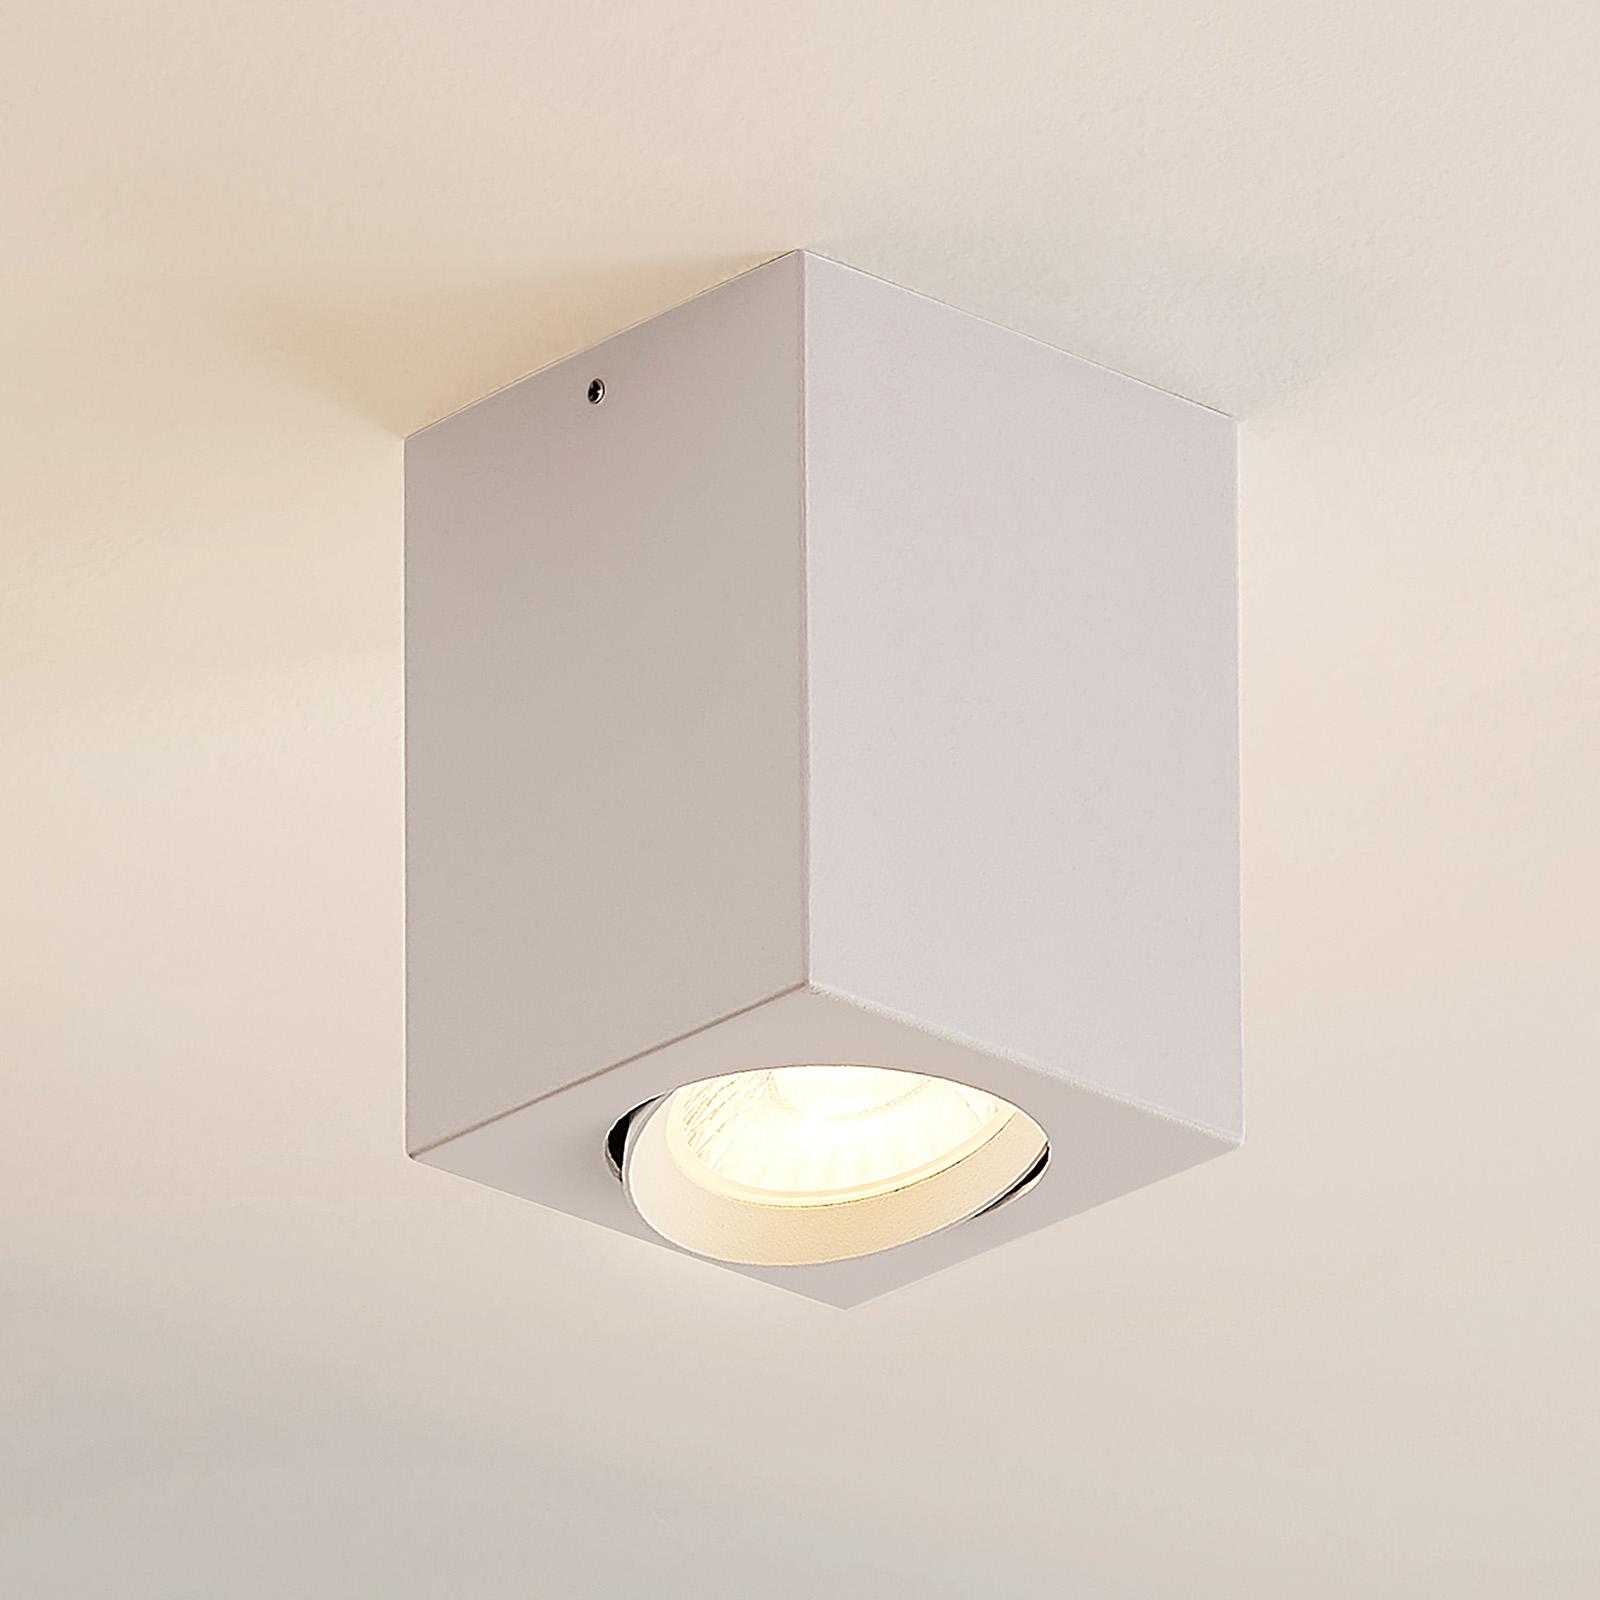 Arcchio Basir LED-Deckenstrahler in Weiß, 8W